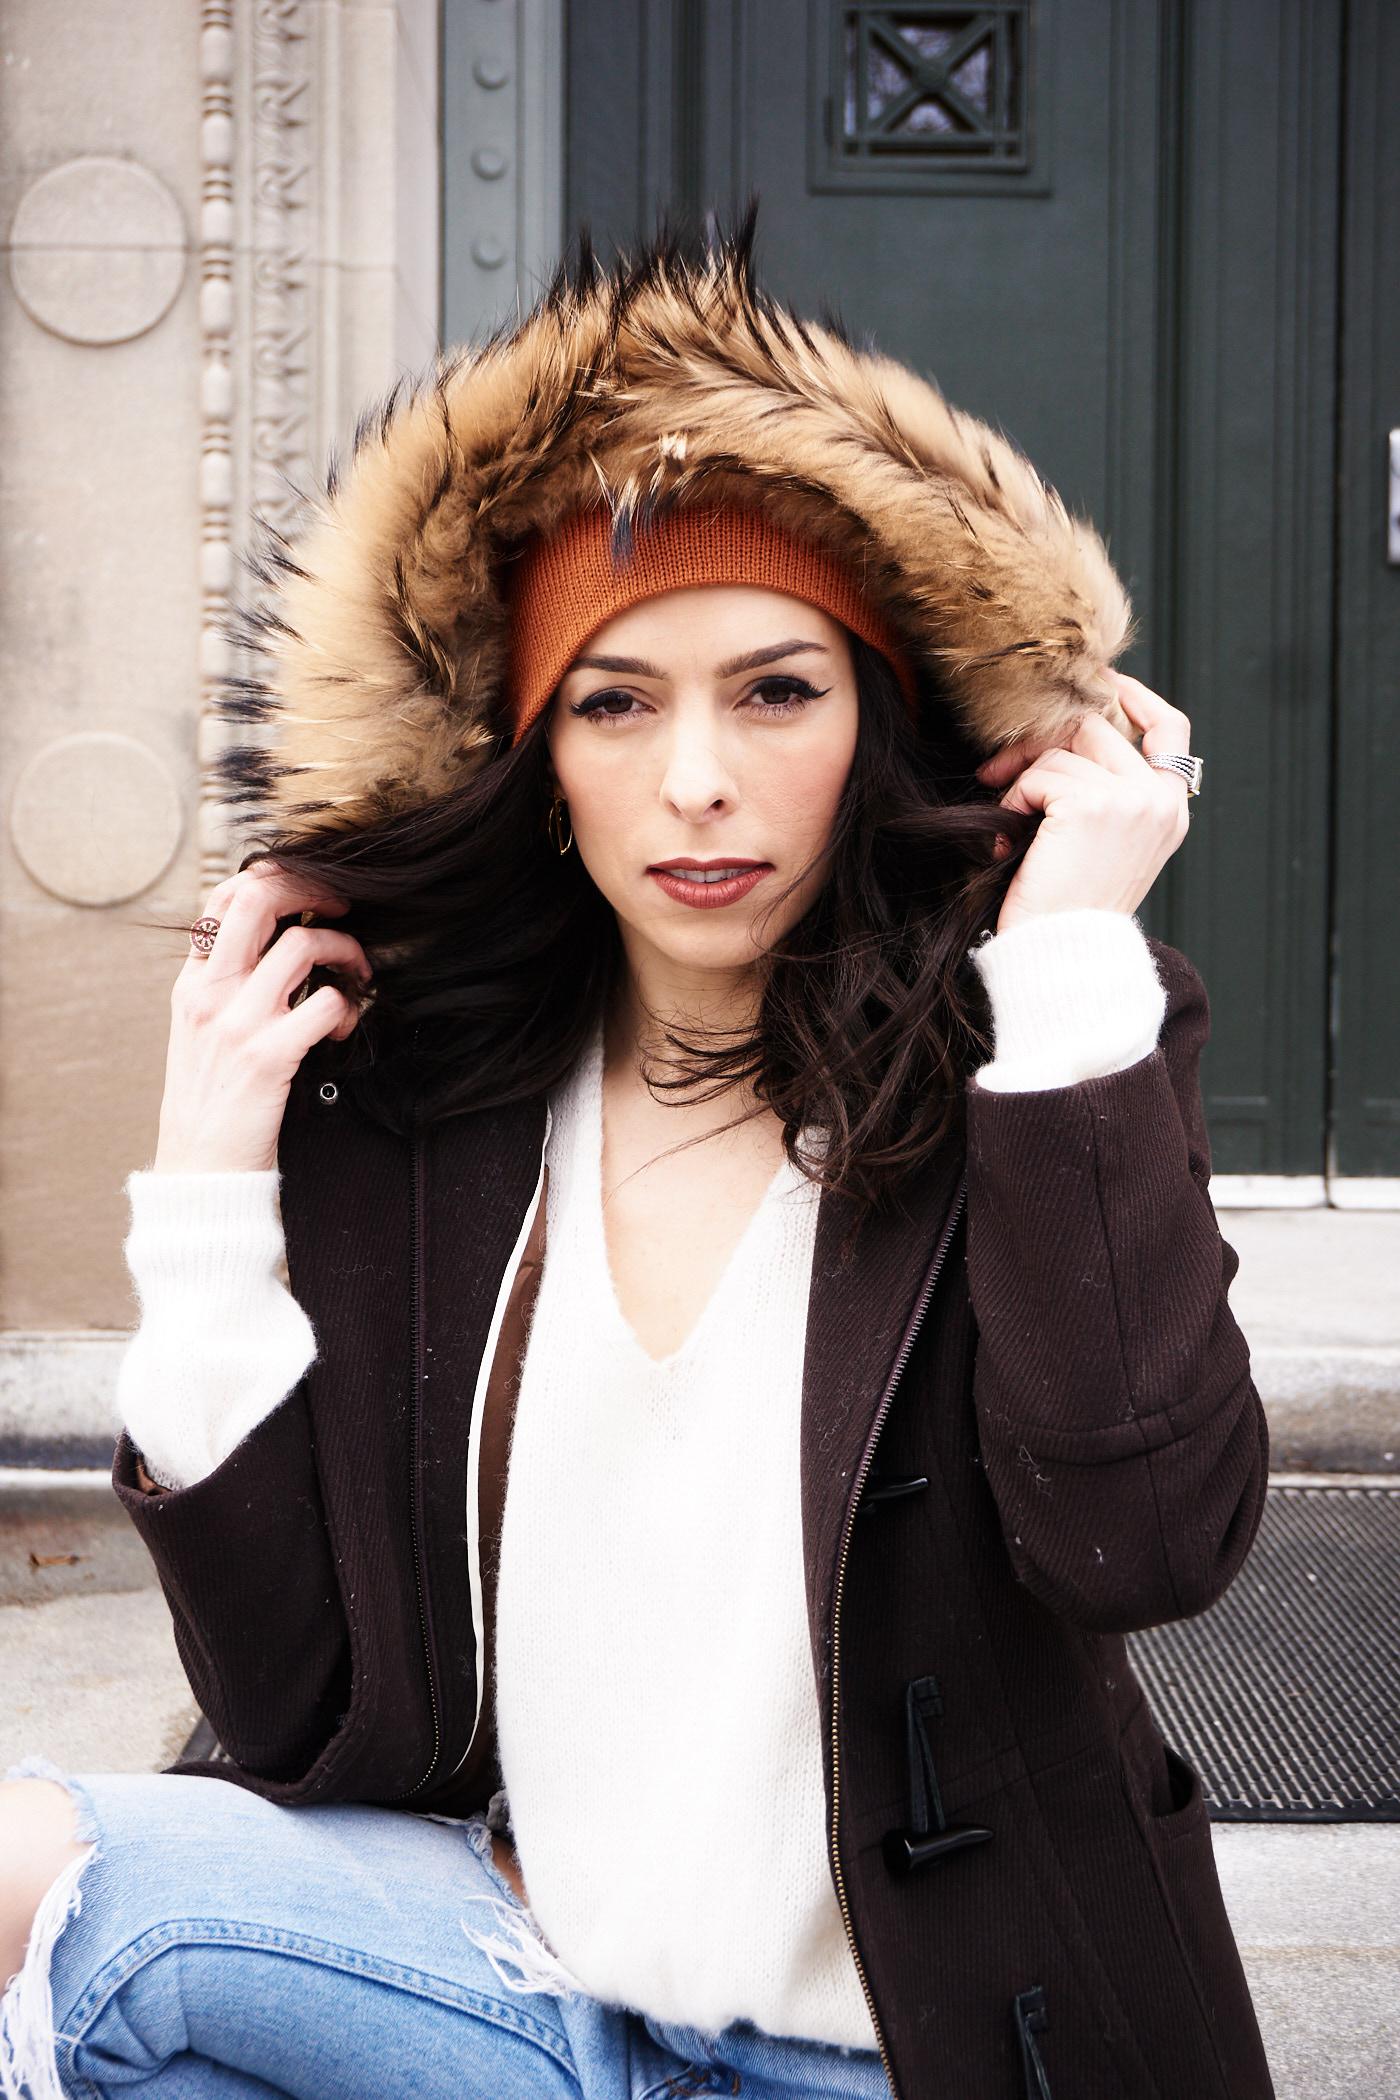 Model @katiewarriorprincess